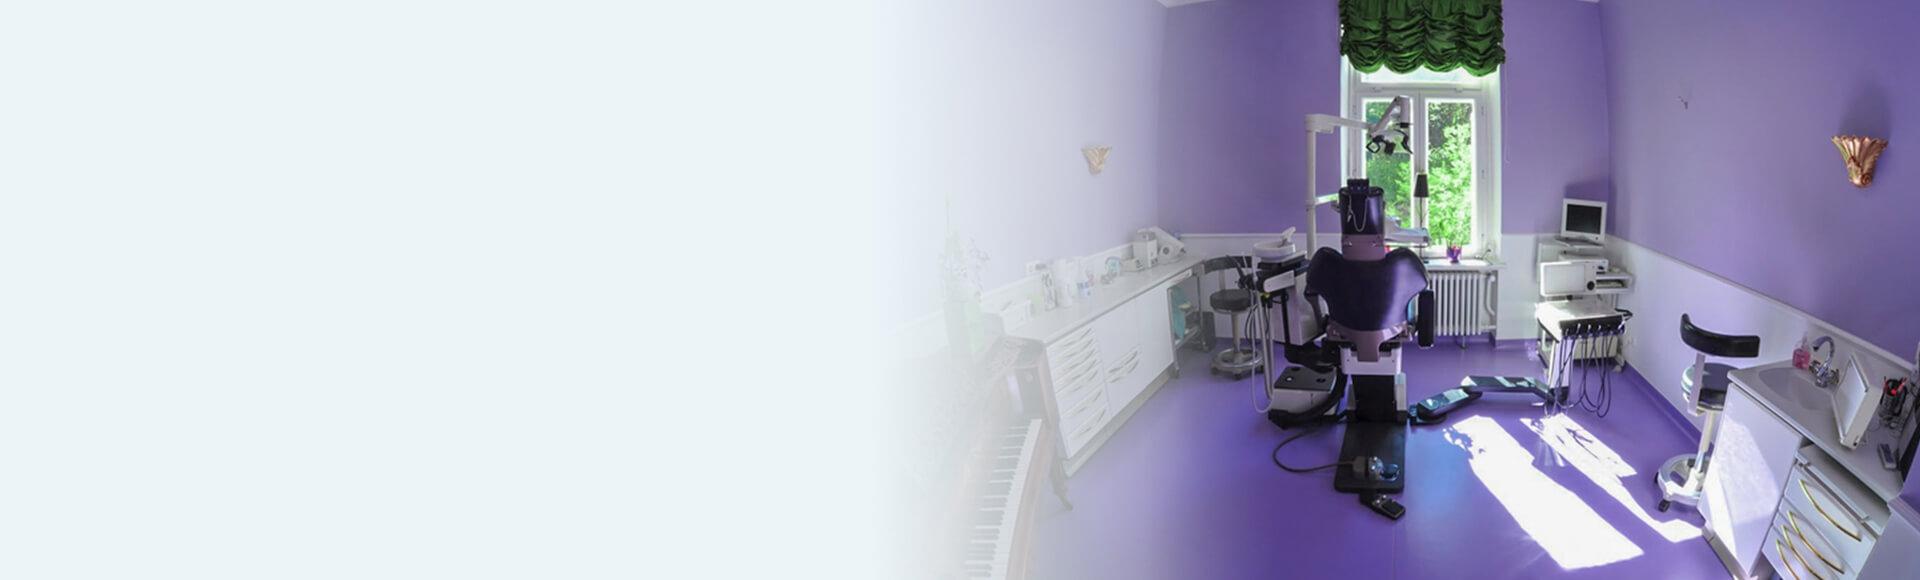 Zahnarztpraxis in der Landratsvilla Eckernfoerde